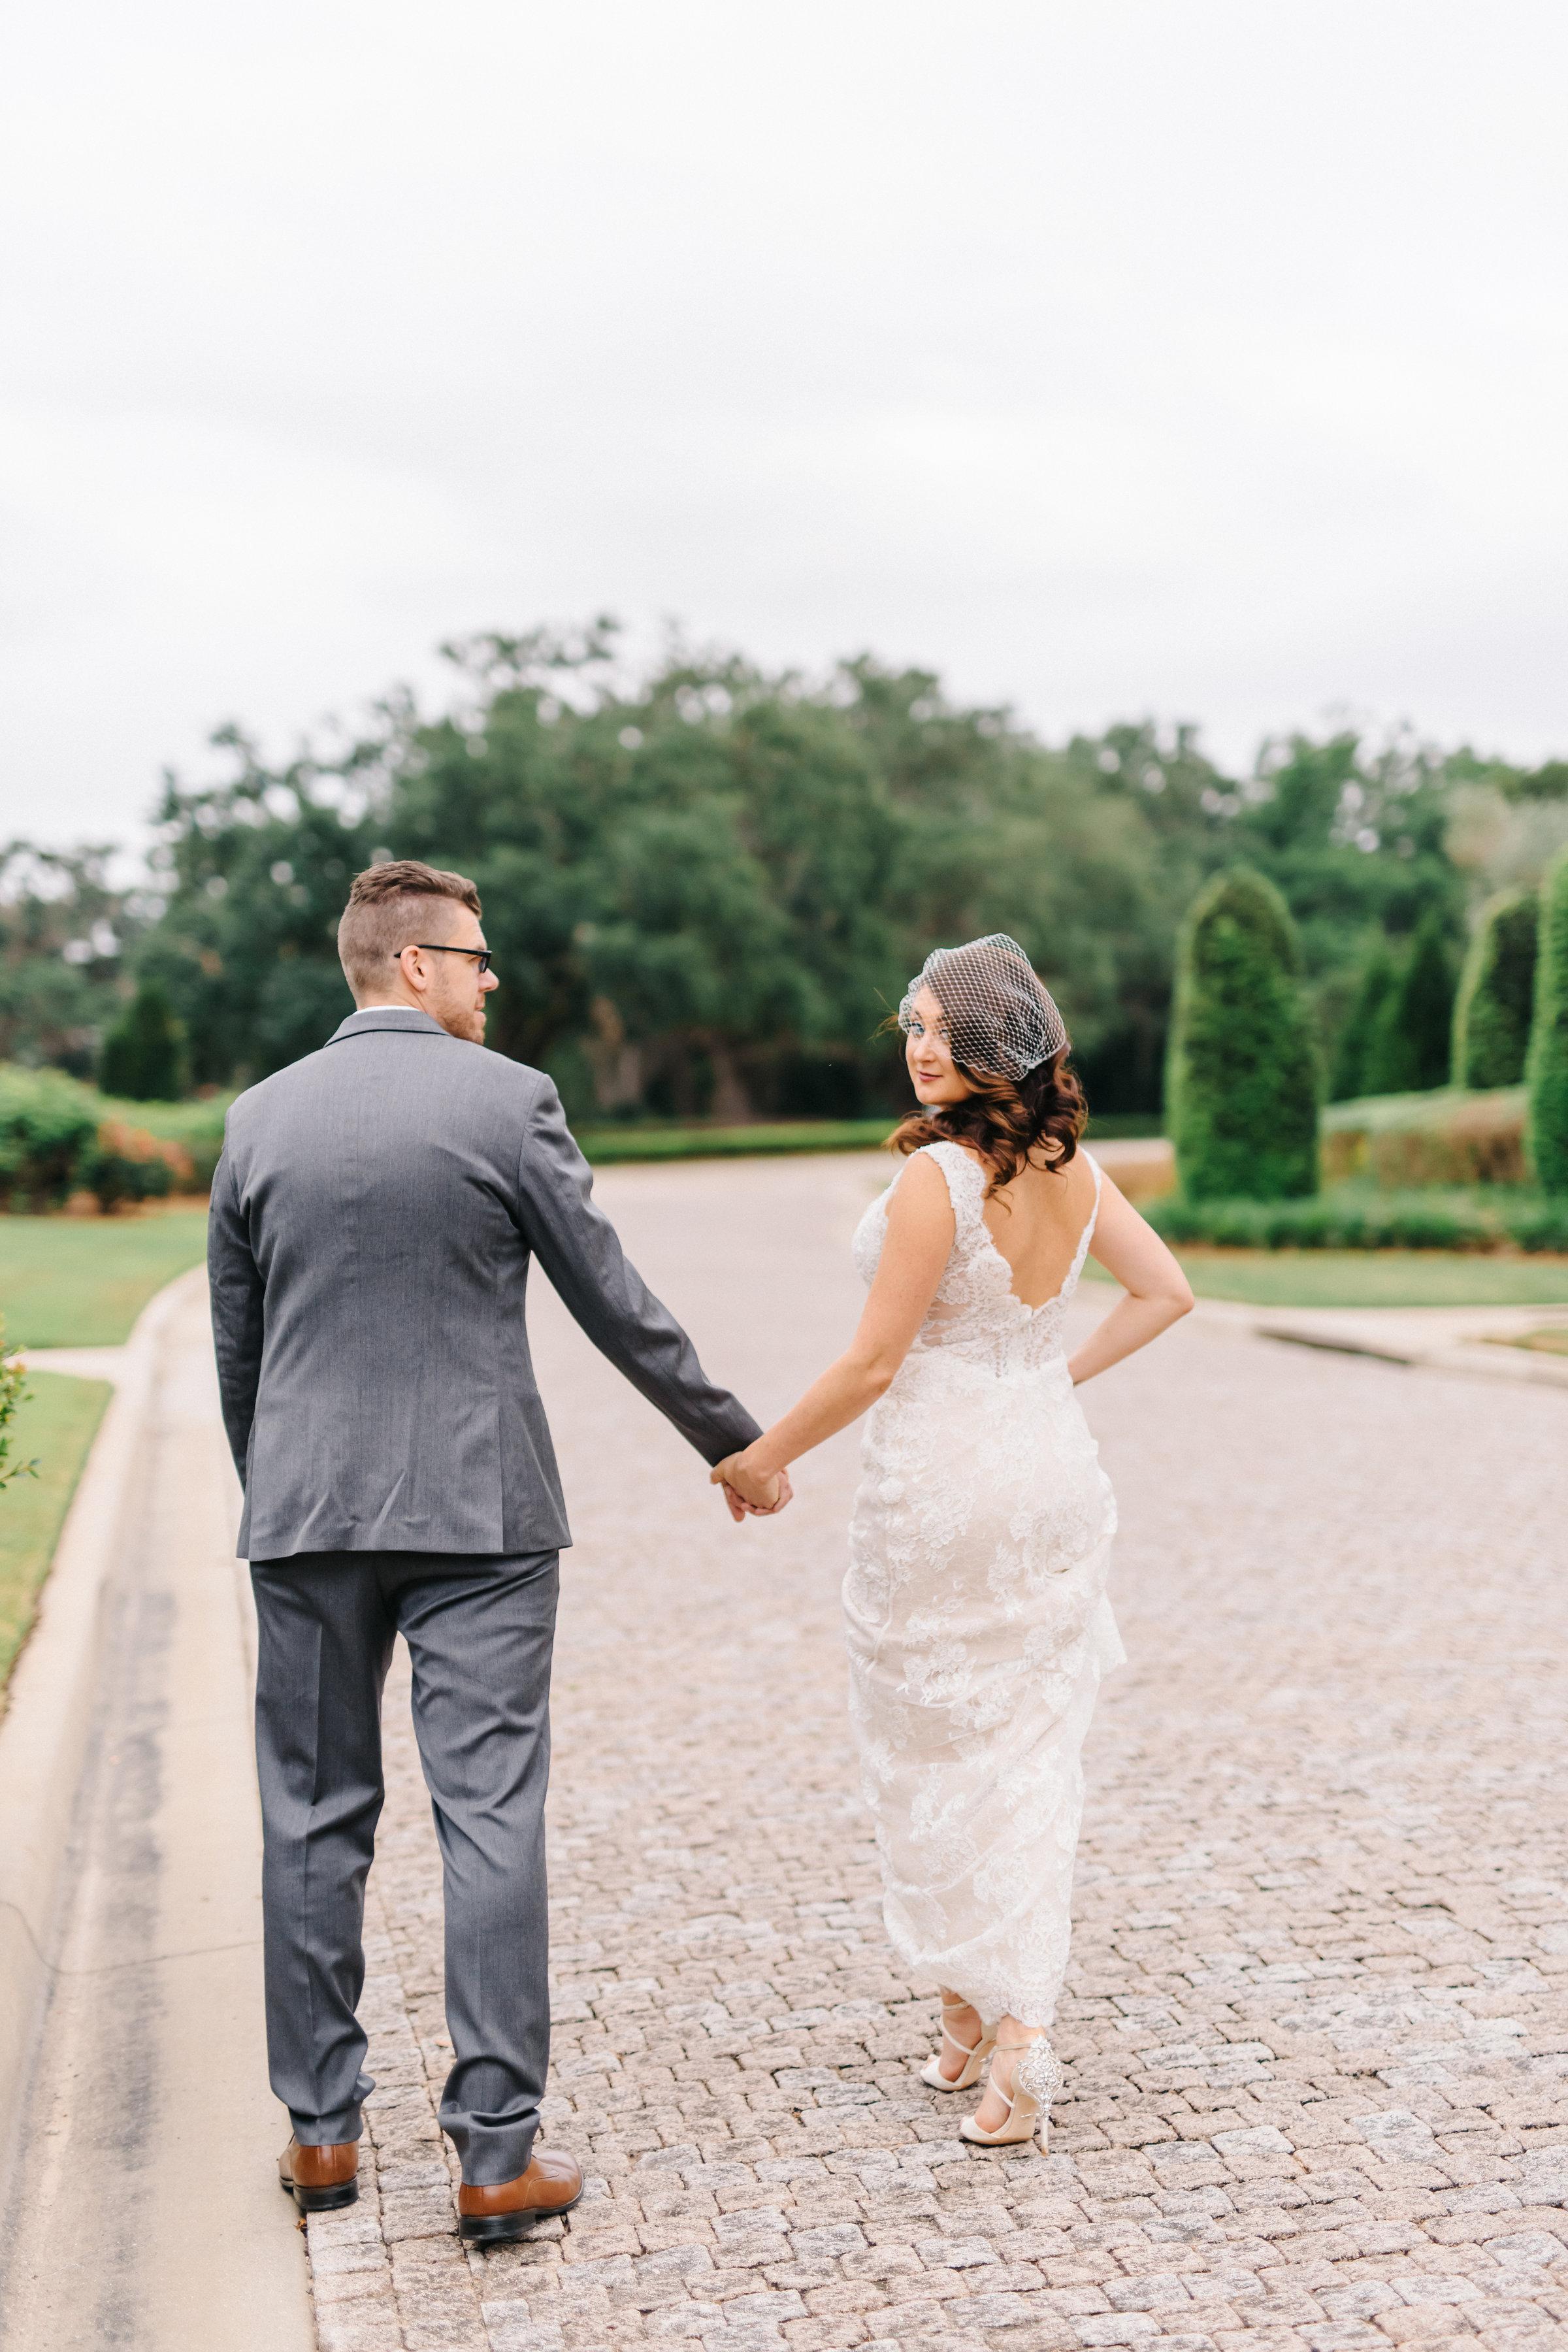 Tuscan inspired wedding  Orlando Wedding Planner Blue Ribbon Weddings  Orlando Wedding Photographer Emma Shourds Photography  Wedding Ceremony at Bell Tower at Bella Collina  Wedding Reception in Atrium at Bella Collina